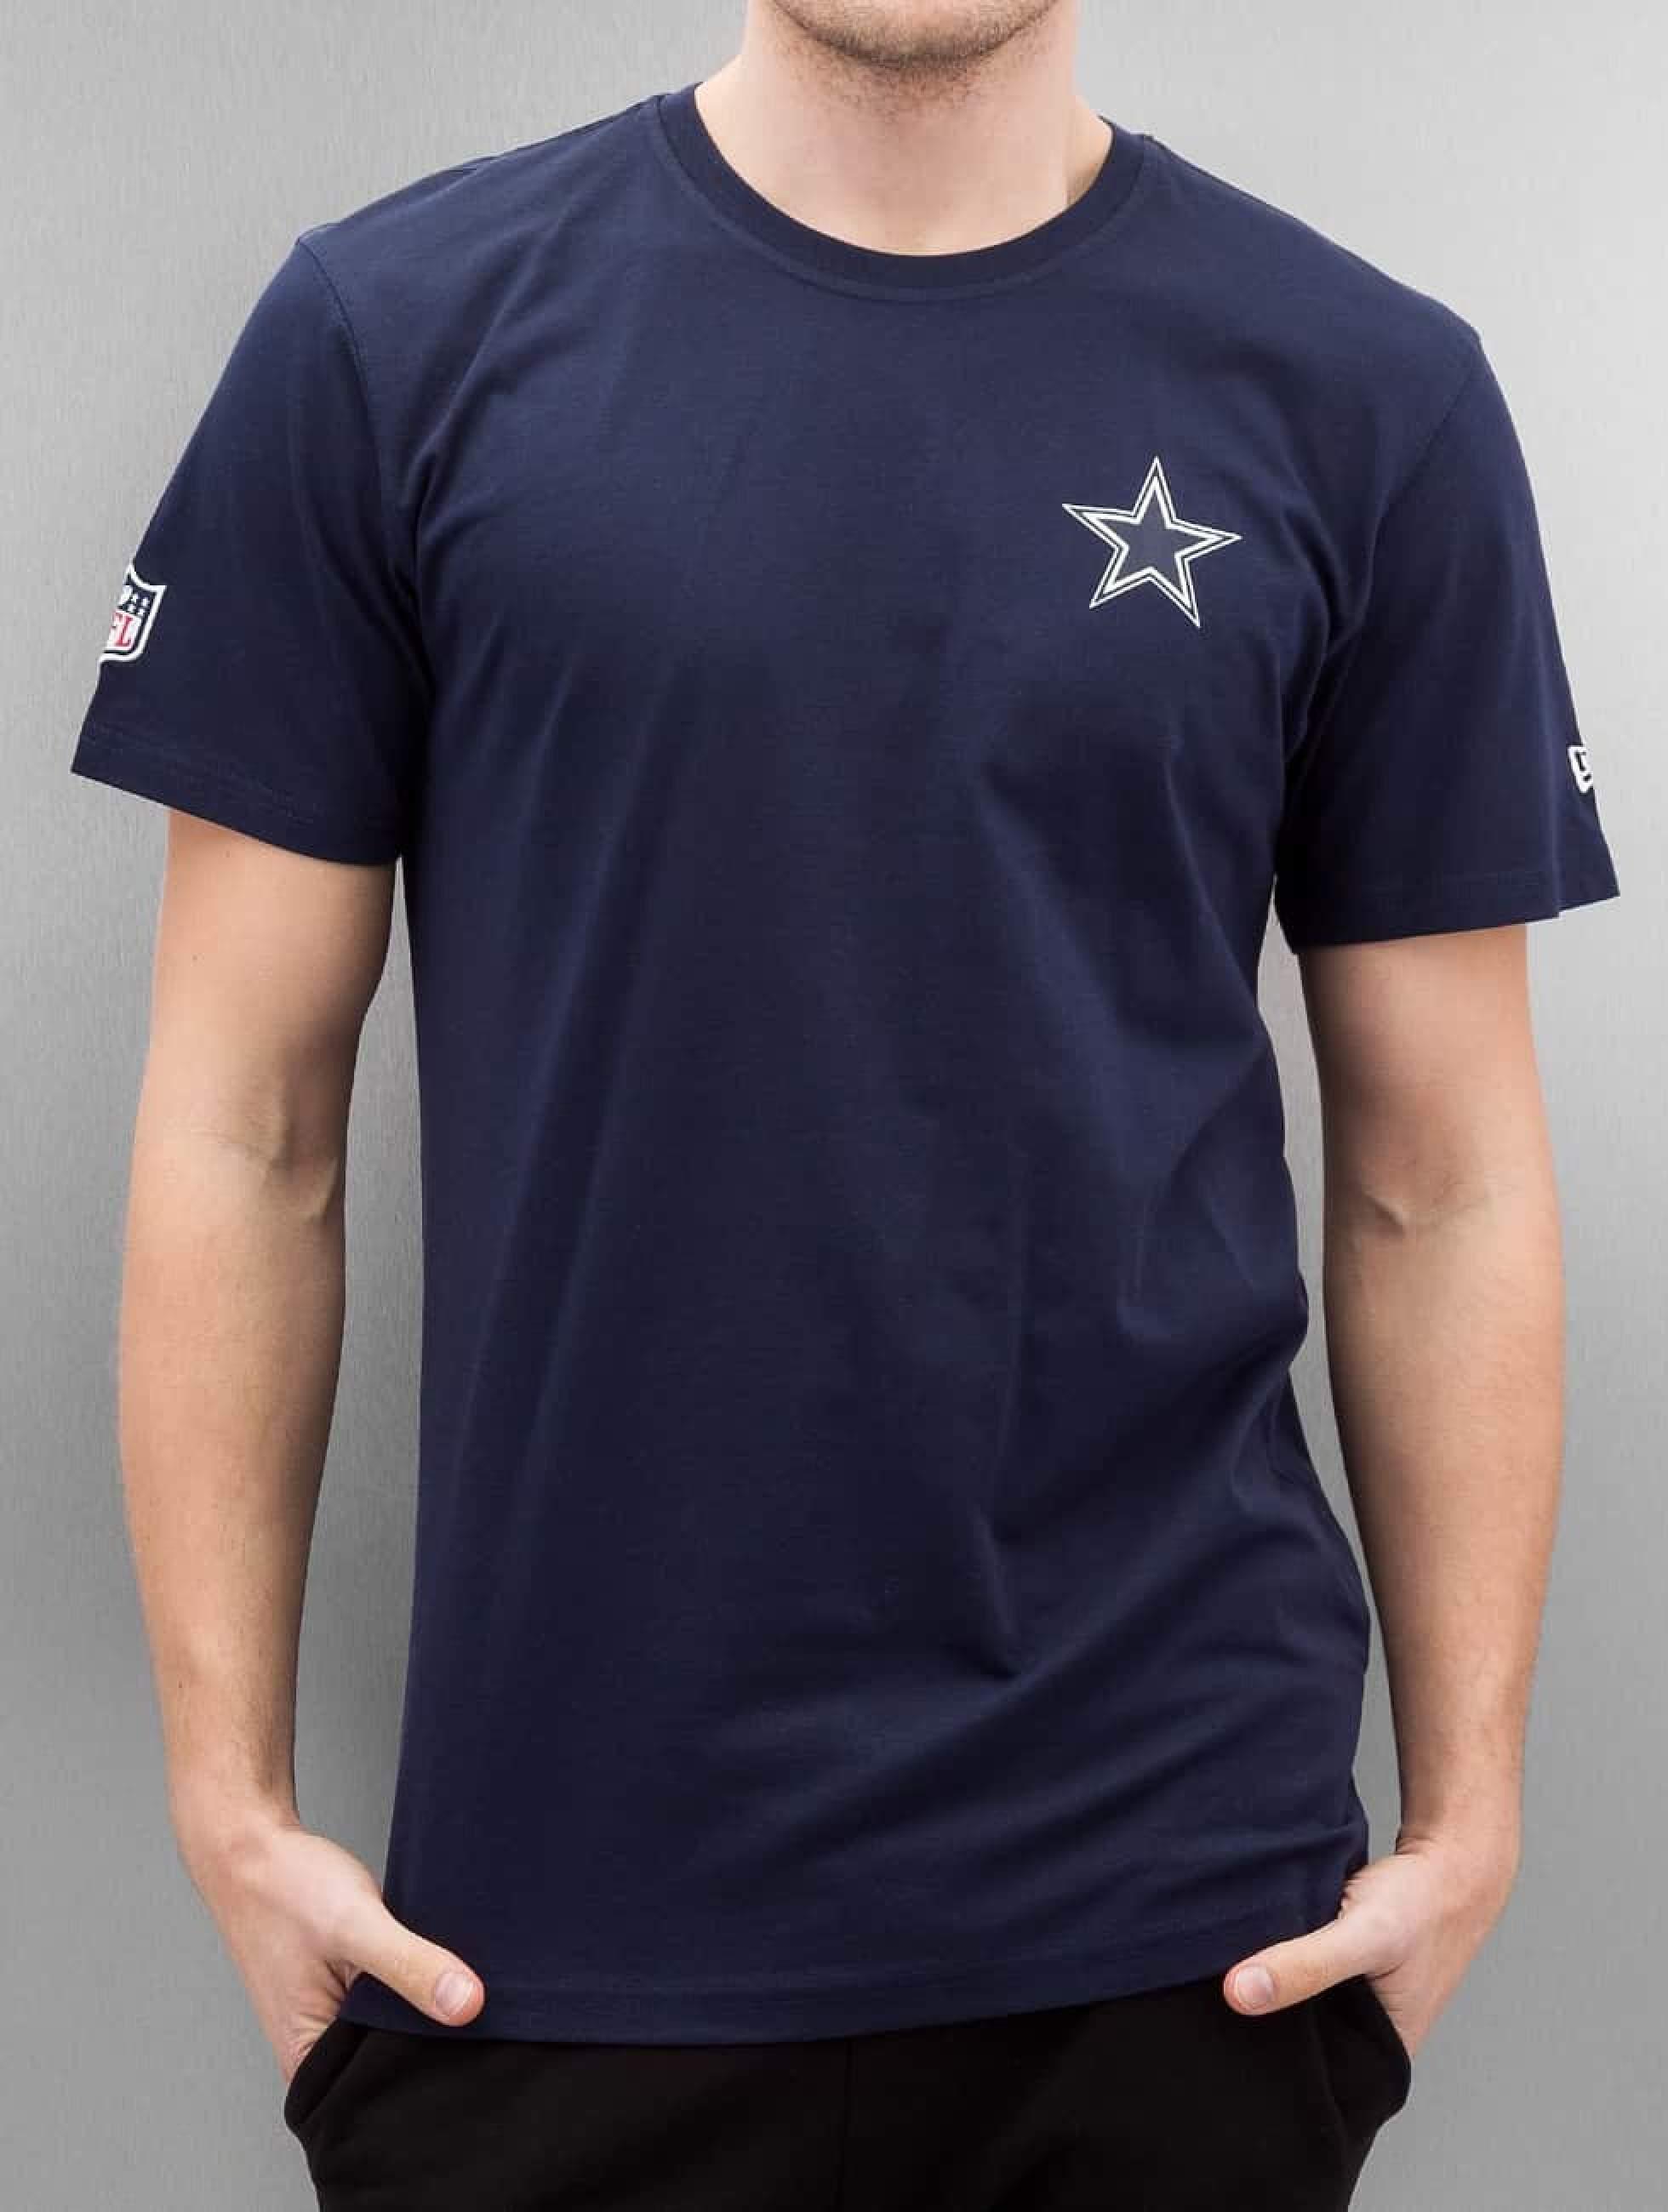 New Era Männer T-Shirt Team Apparel in blau